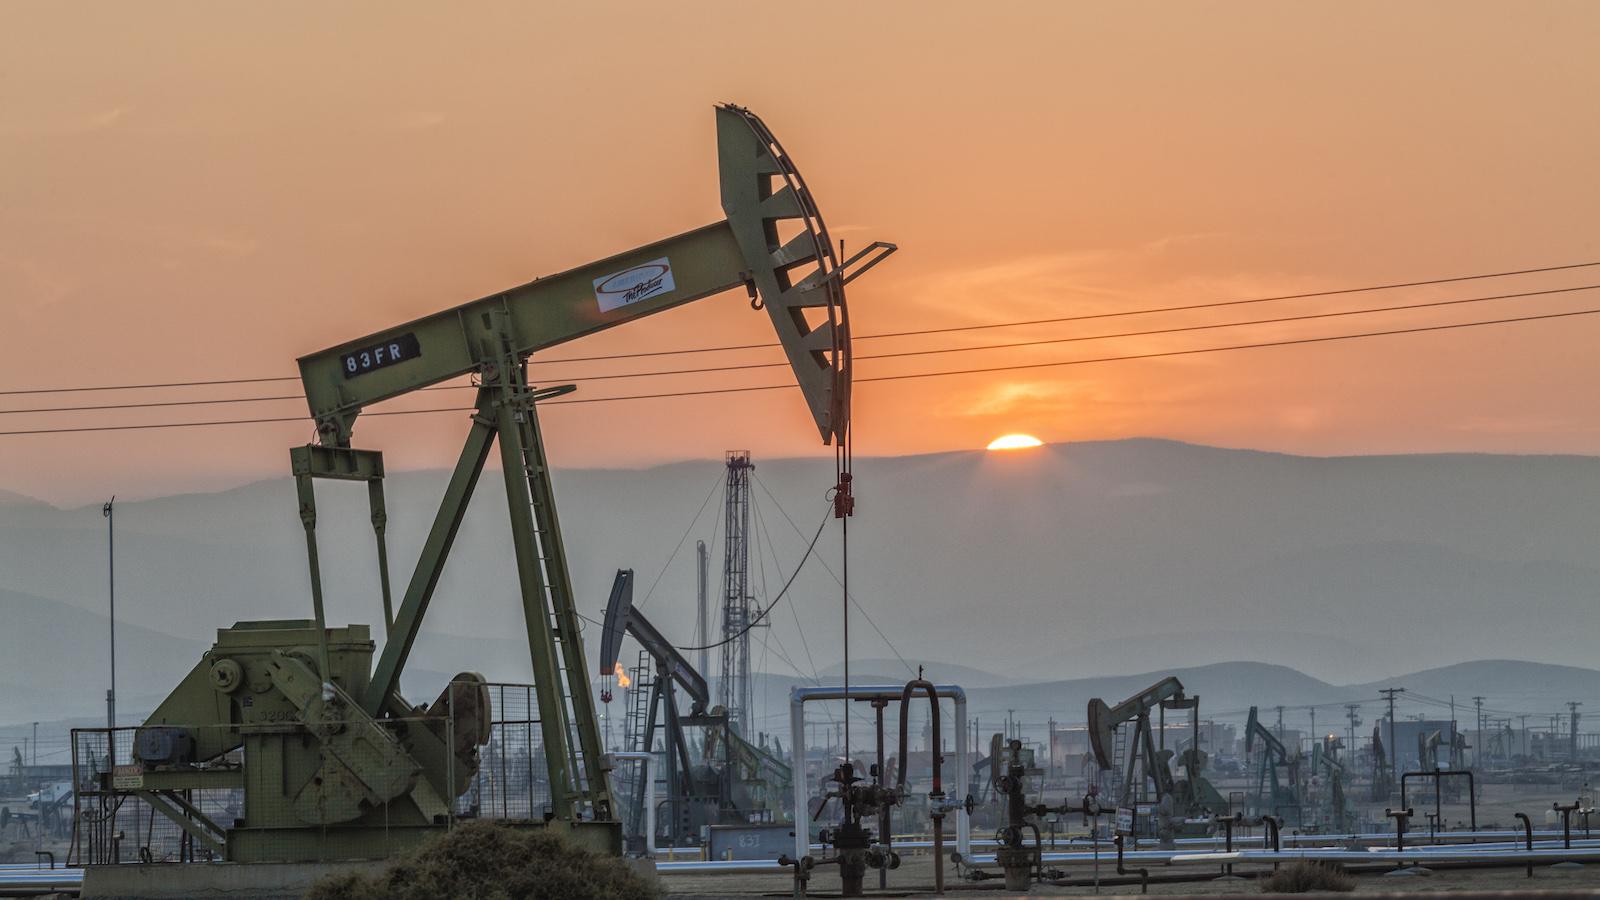 Oil pumpjacks in California